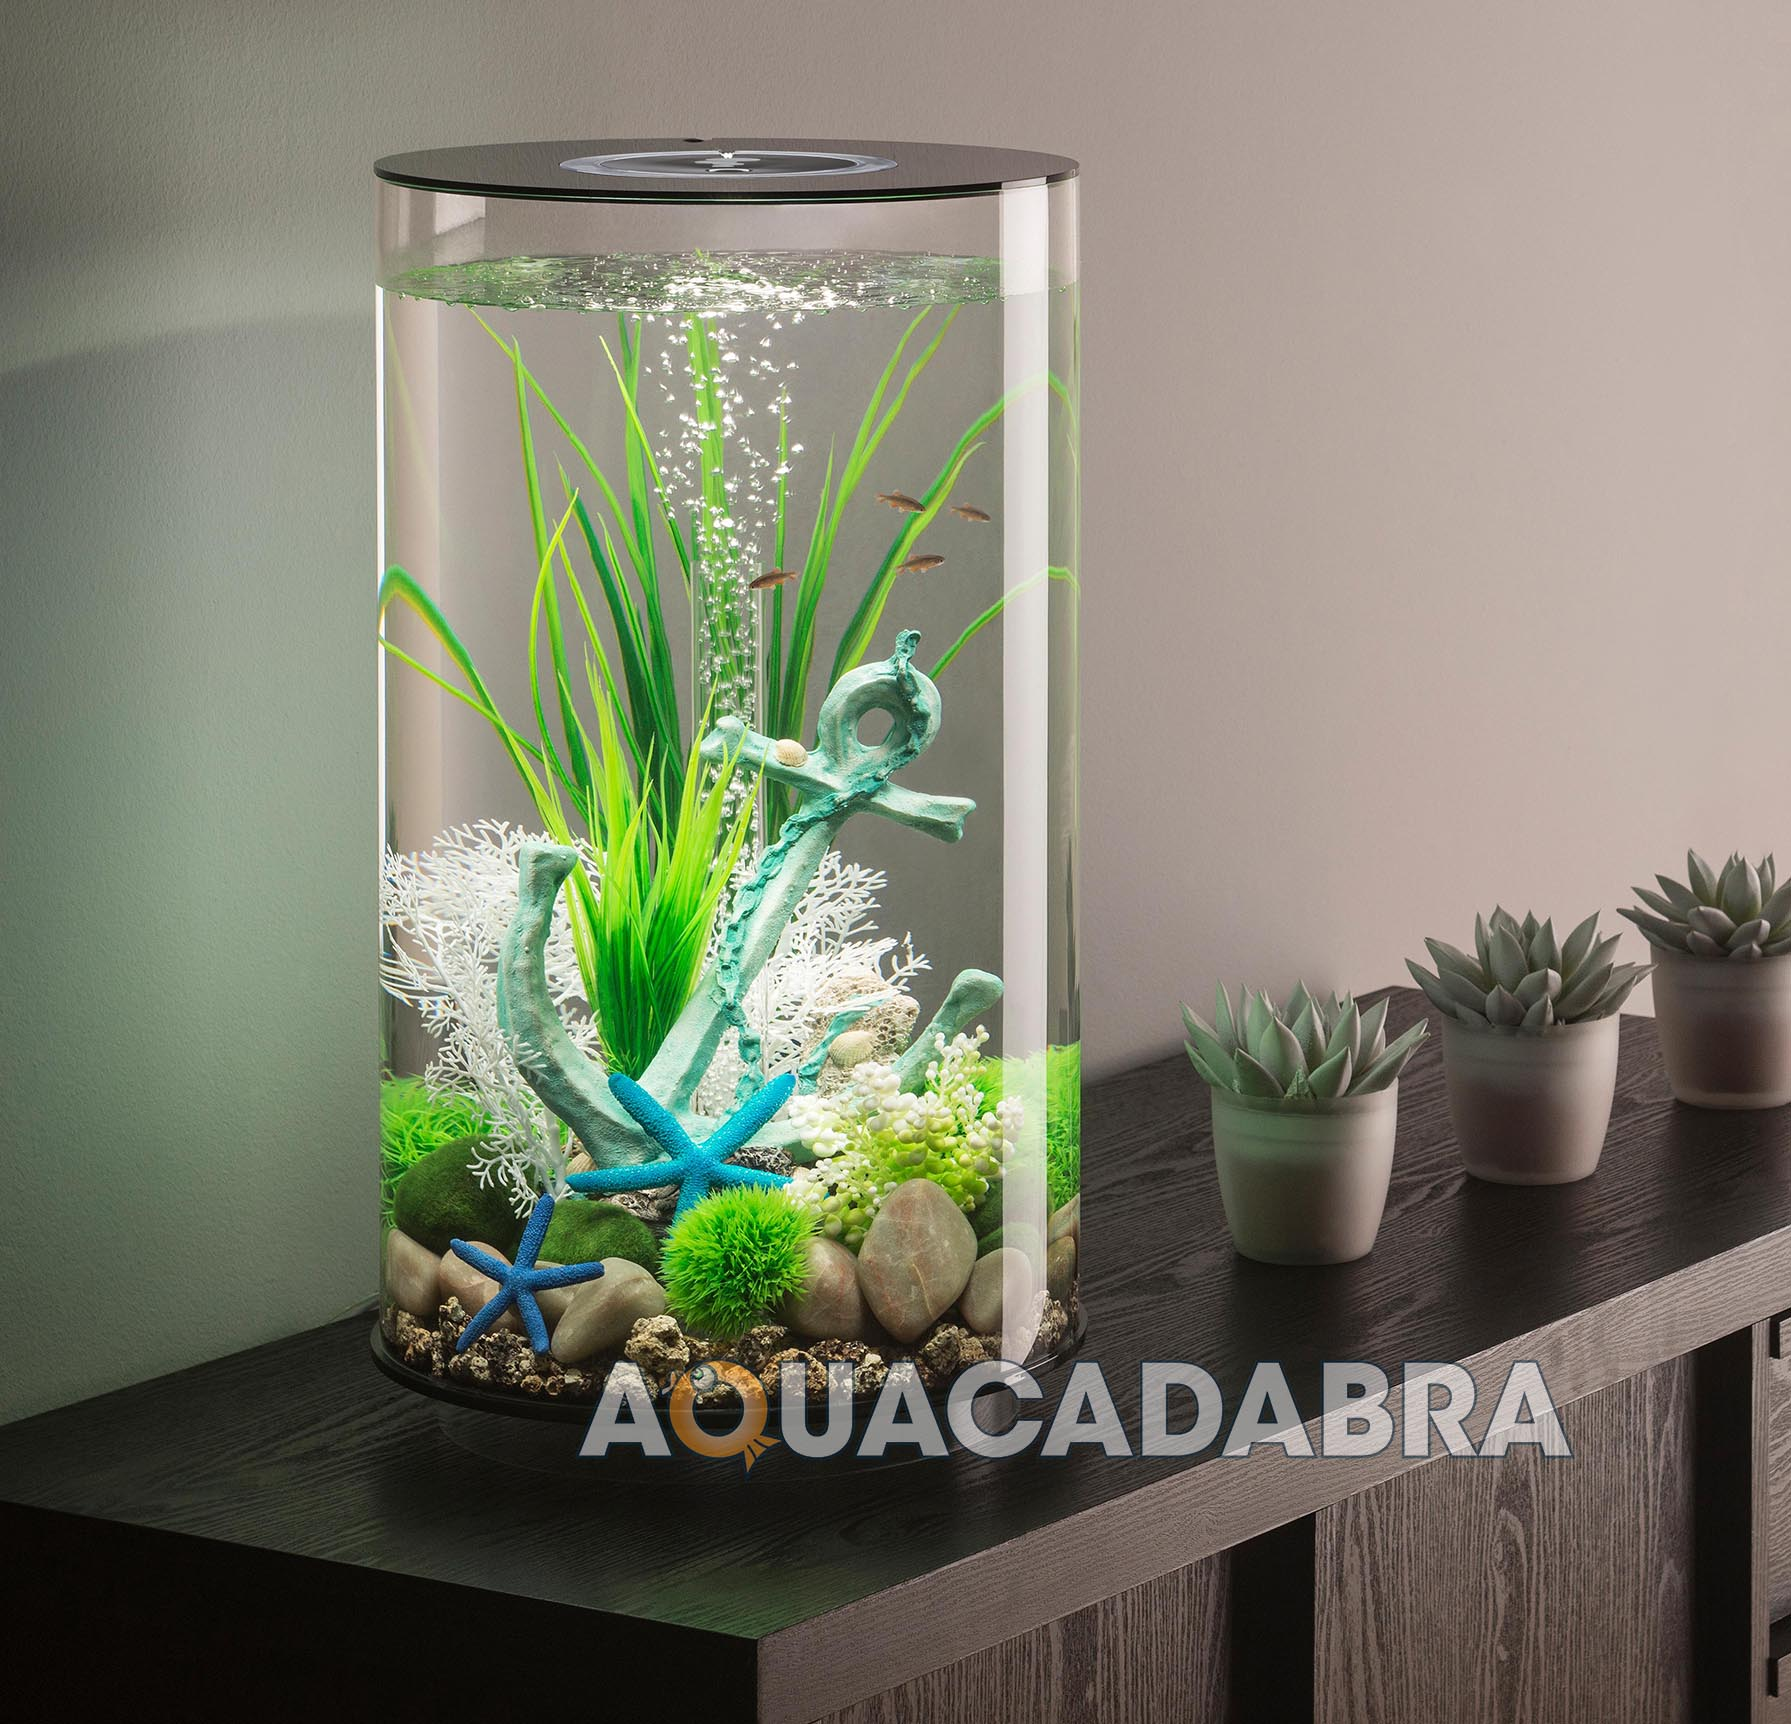 fixture saltwater white blue com tanks fish and freshwater aquarium inch dp leds amazon for ae color led lighting light suitable mingdak